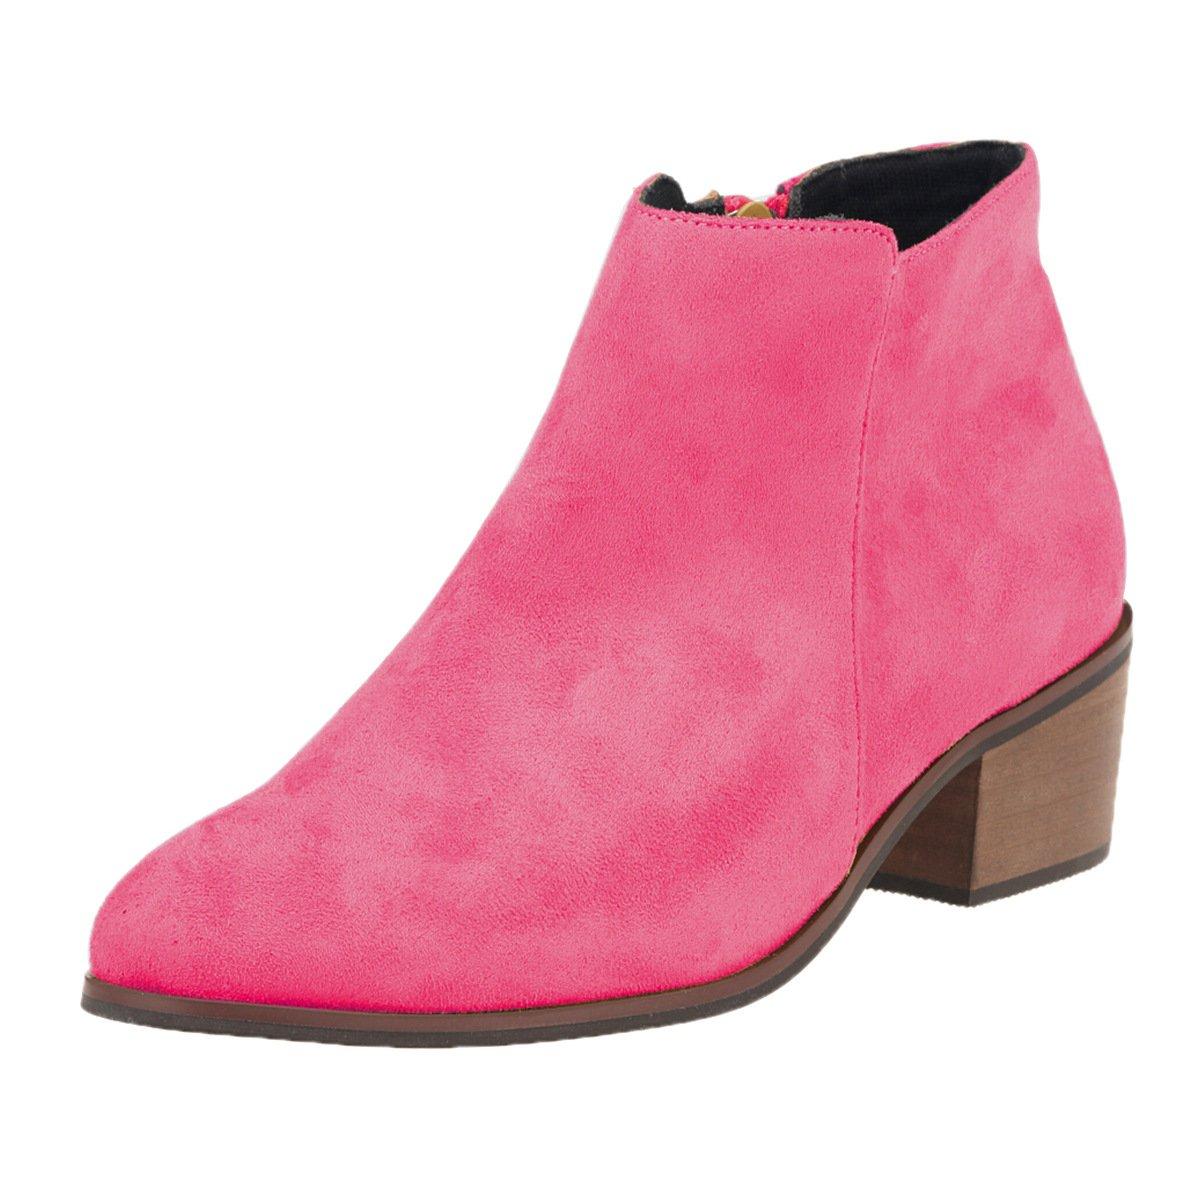 DYF Frauen Schuhe Kurze Stiefel Farbe Größe Größe Größe Scharfe Rauhe Ferse Reißverschluss, Mae Rot FLA, 42 8e1377